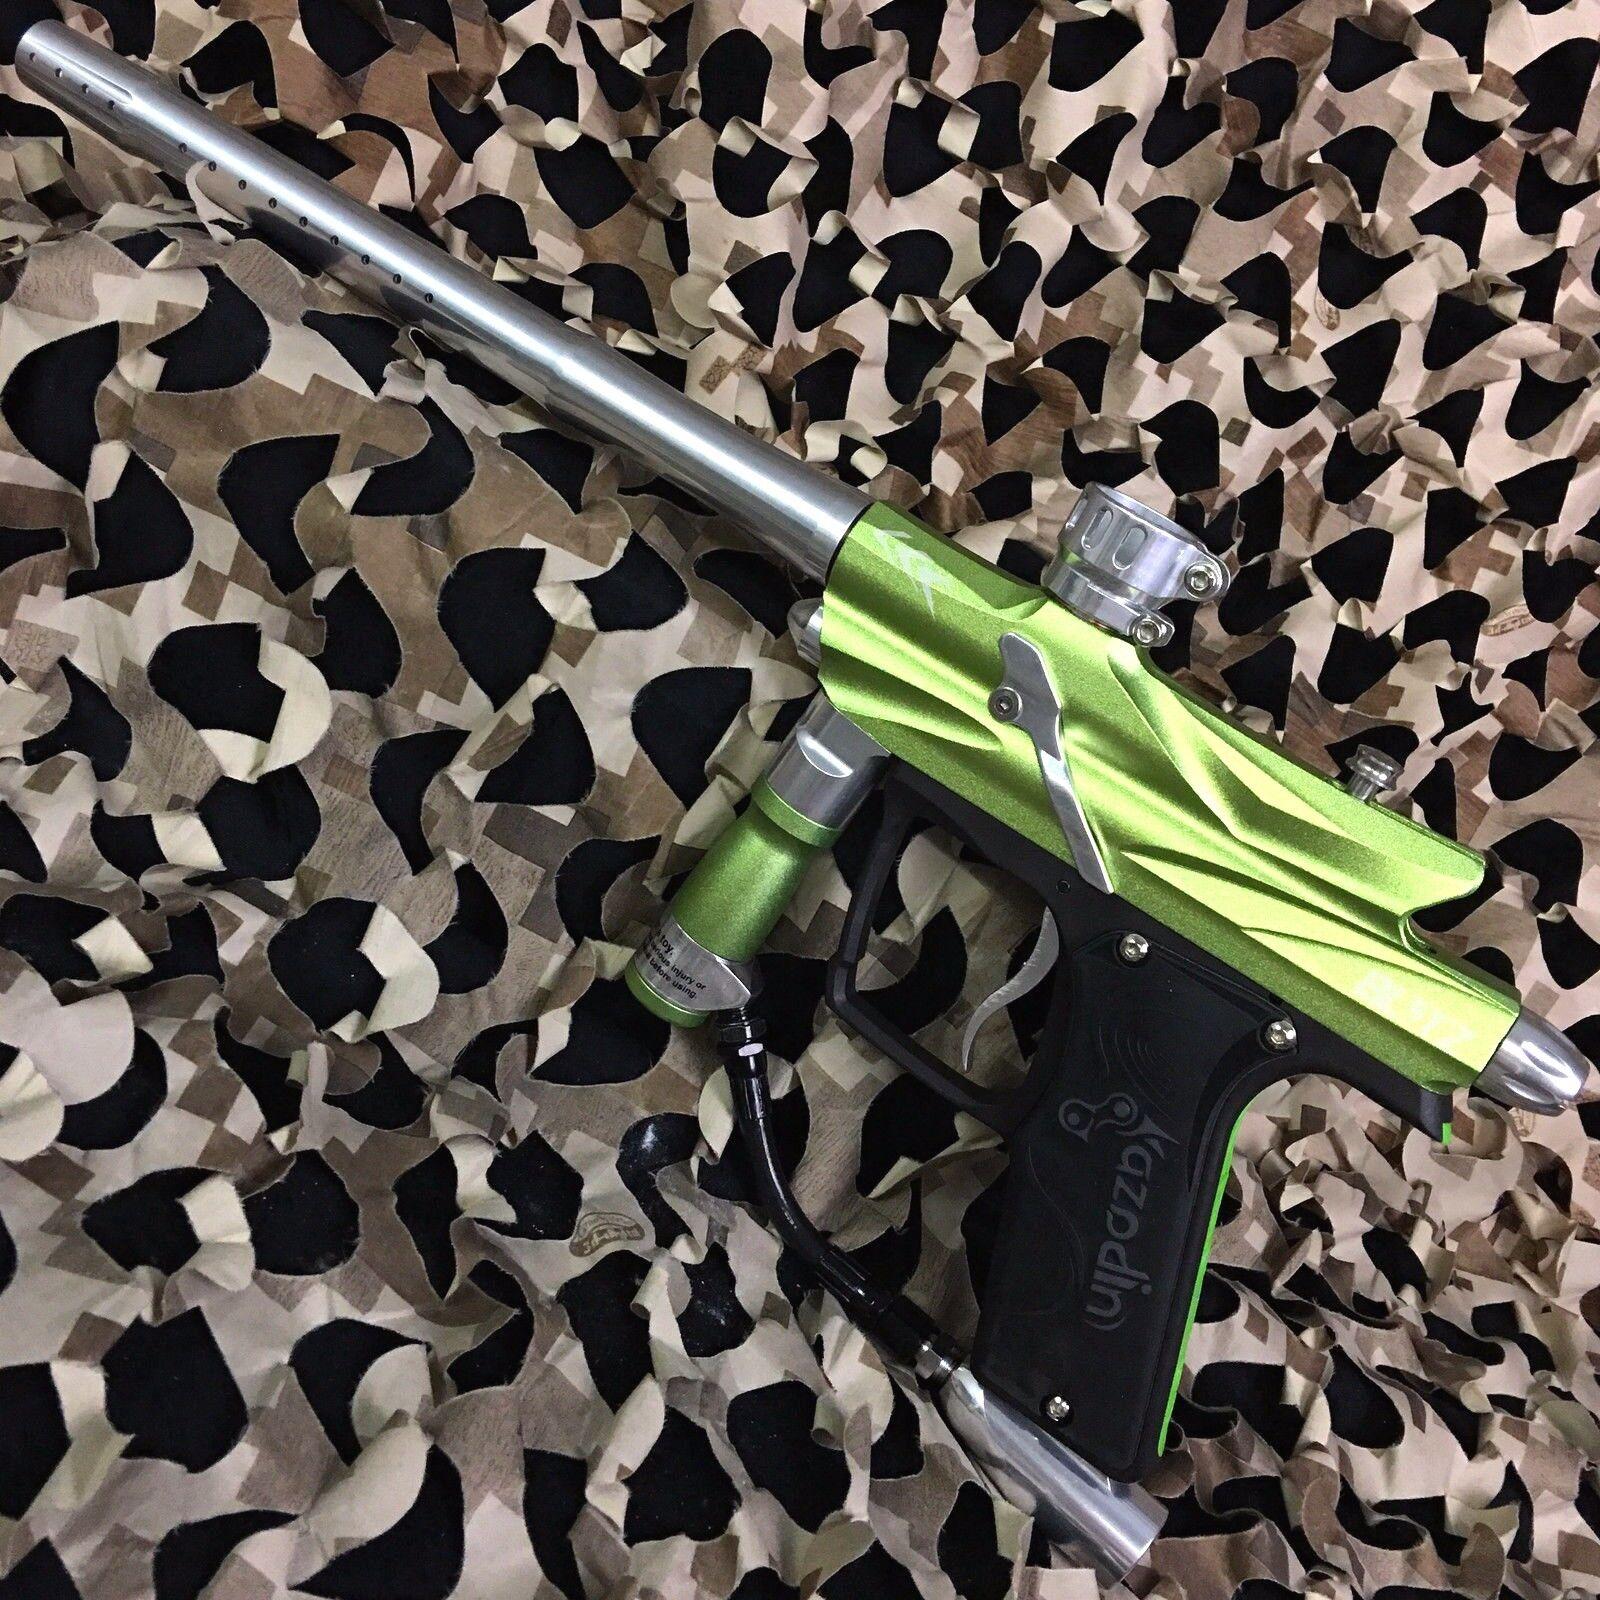 NEW Azodin Blitz 3 Electronic Paintball Gun Marker - Green/